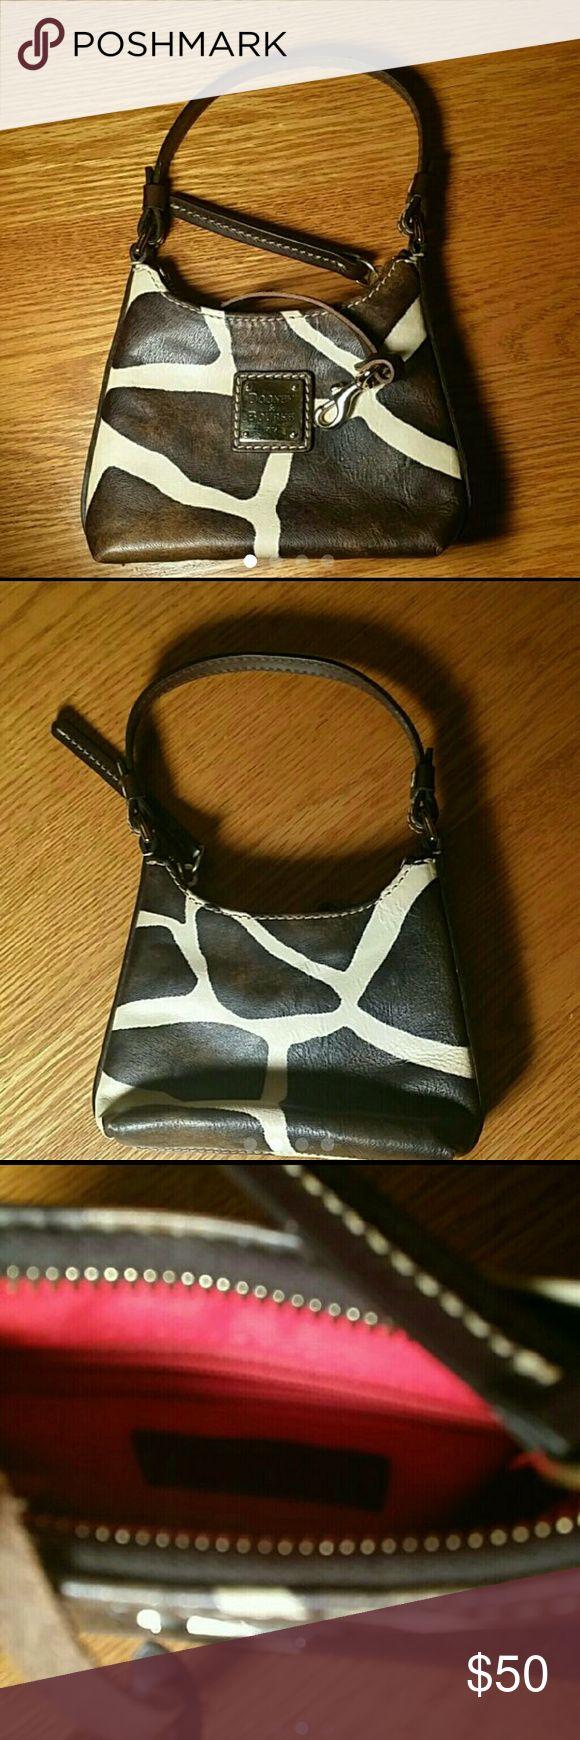 Selling this Dooney & Burke Zebra Print (Betsy Bag) on Poshmark! My username is: leannbrawley. #shopmycloset #poshmark #fashion #shopping #style #forsale #Dooney & Bourke #Handbags